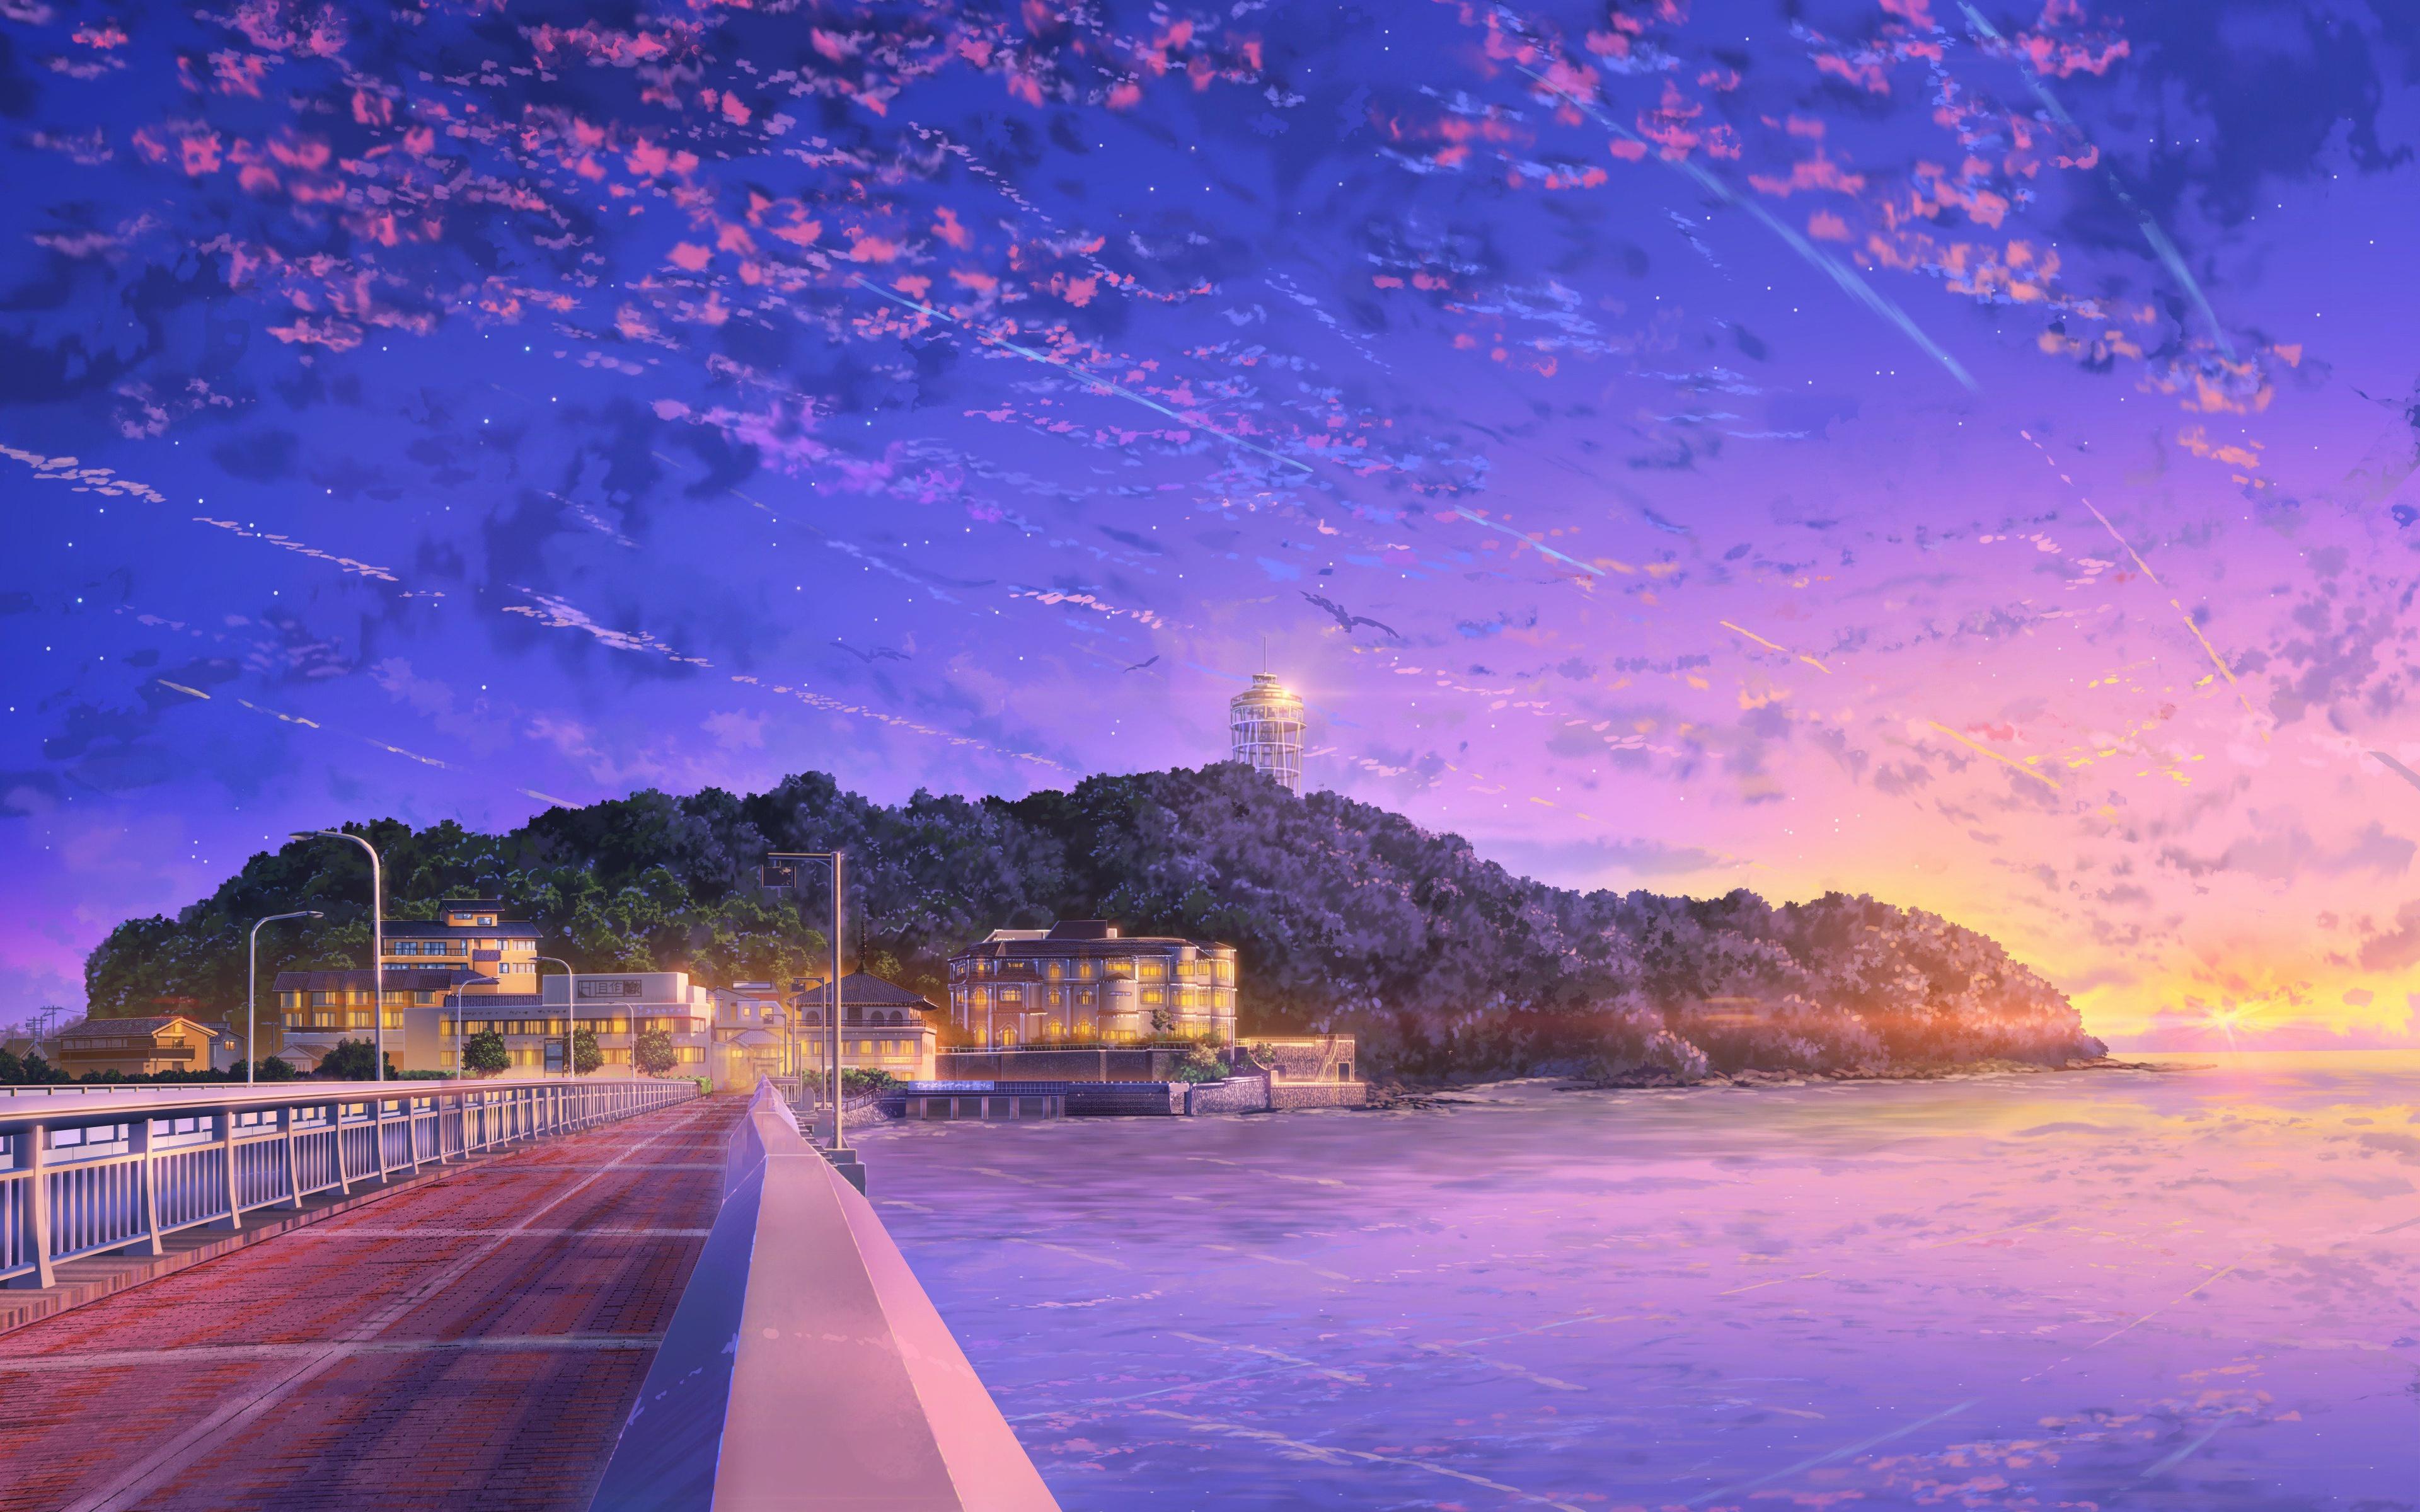 3840x2400 Japan Anime Sky 4k 4k HD 4k Wallpapers, Images ...